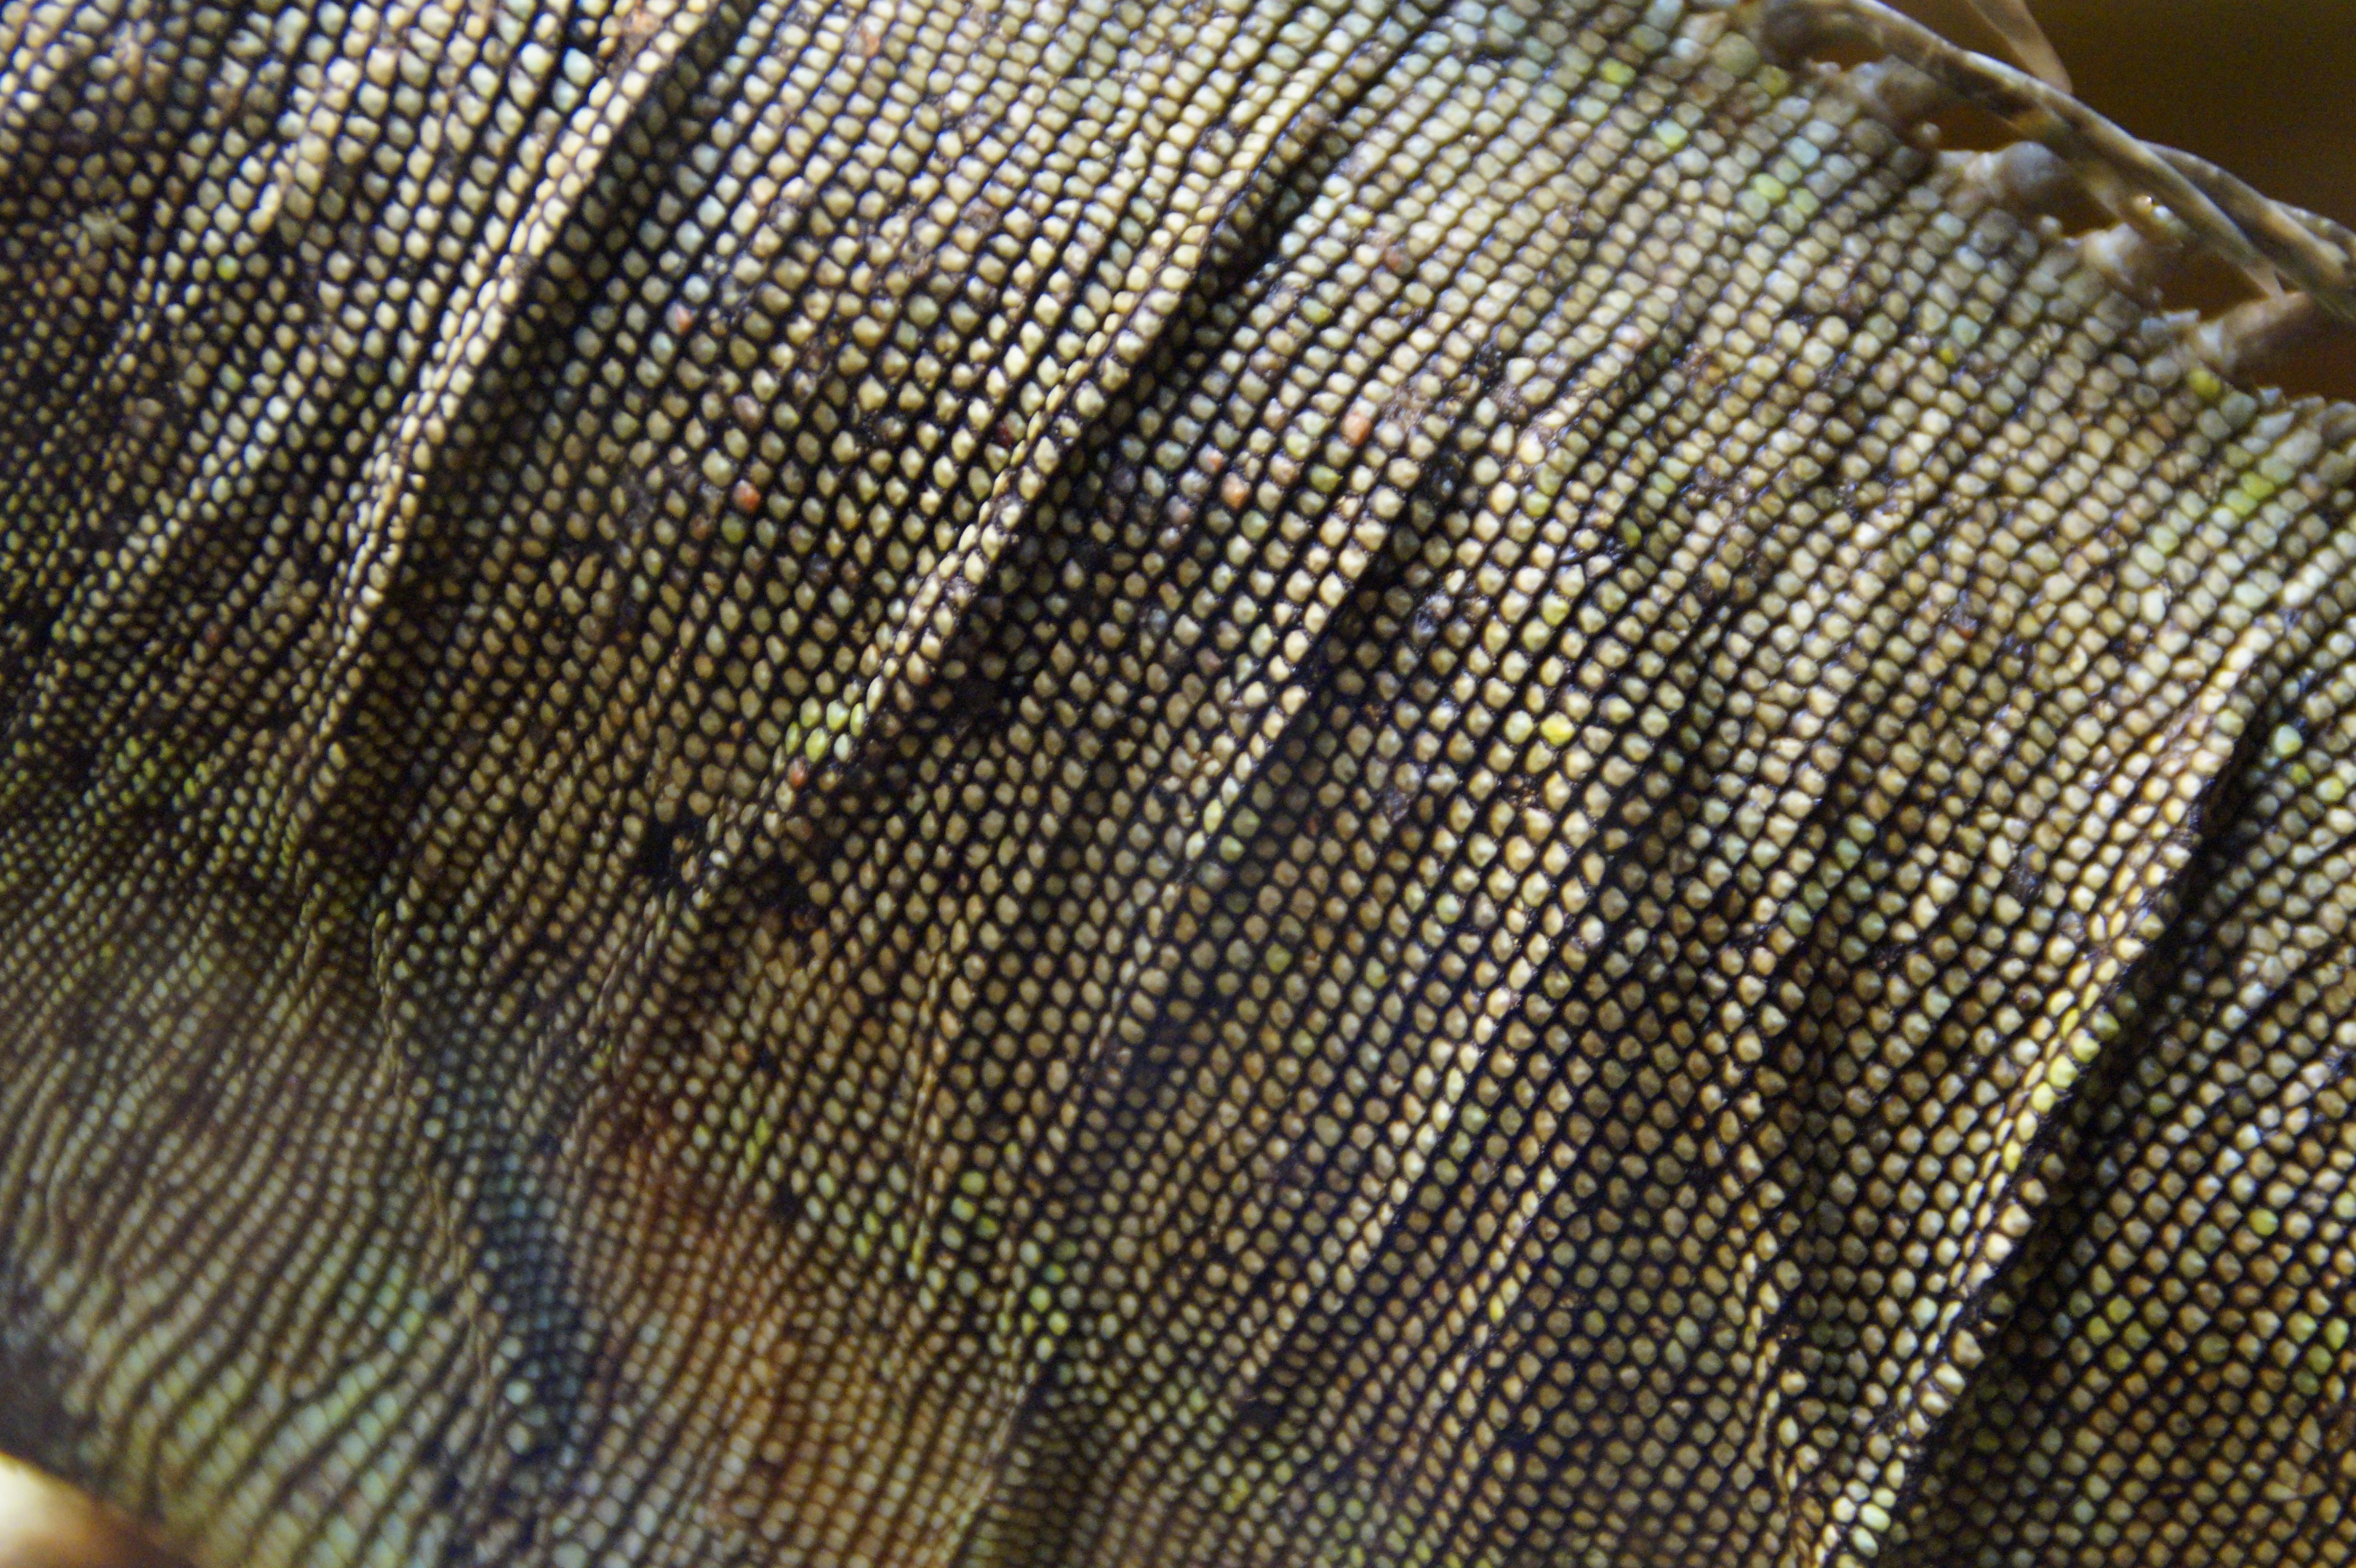 Kostenlose foto : Struktur, Textur, Muster, Reptil, Rahmen ...